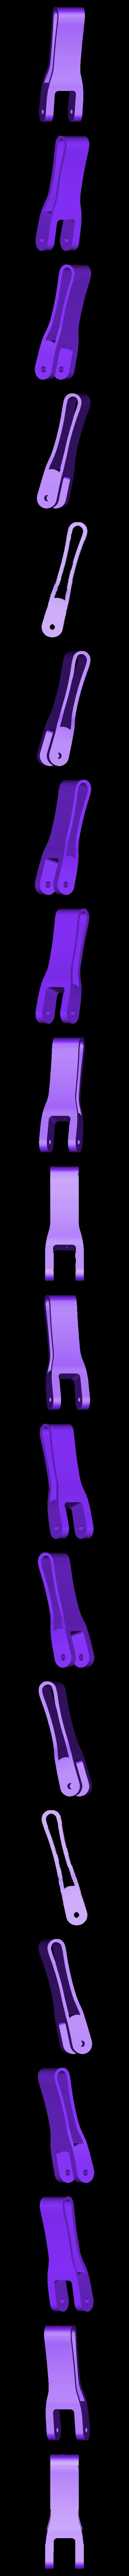 C9_X1.stl Download STL file Adjustable lamp - with vertebrae  • 3D printable object, Ciokobango